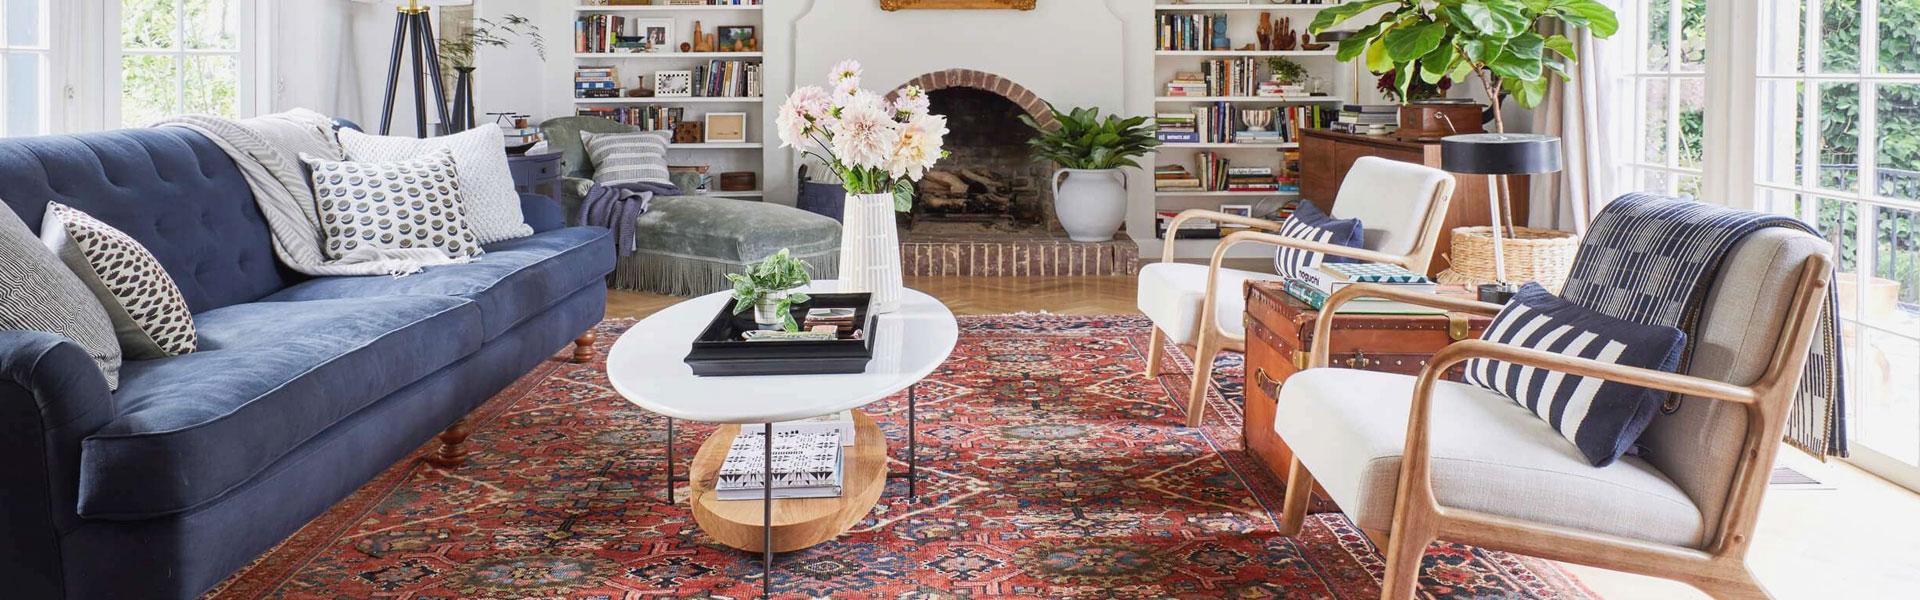 دکوراسیون منزل و گل آرایی منزل نوعروس وبسایت معماریال